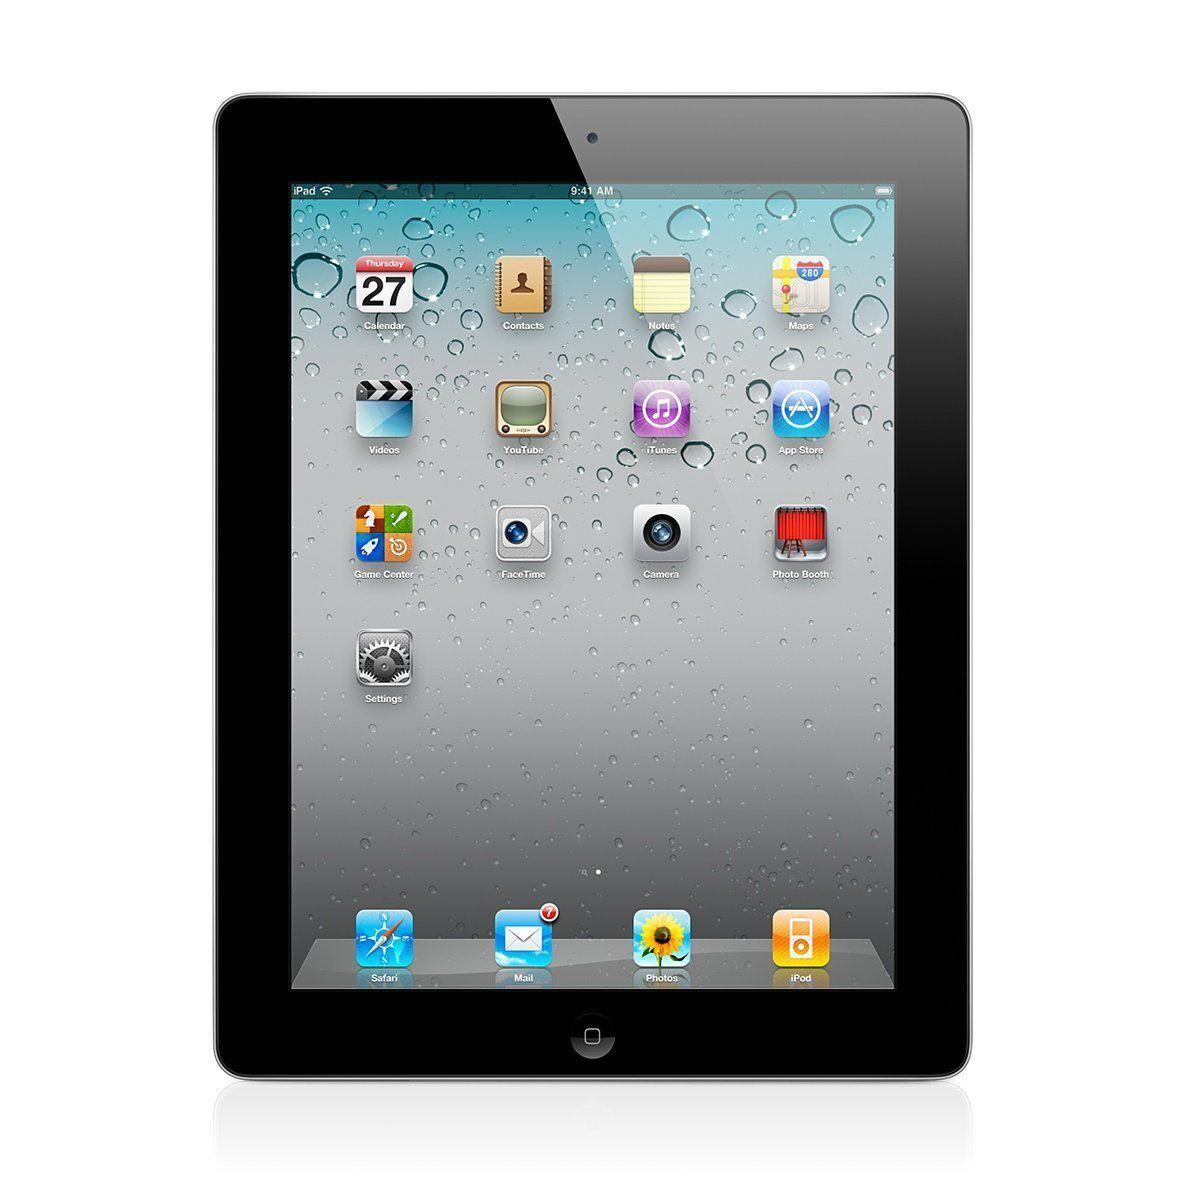 Apple iPad 2 16GB BLACK WIFI CLEAN